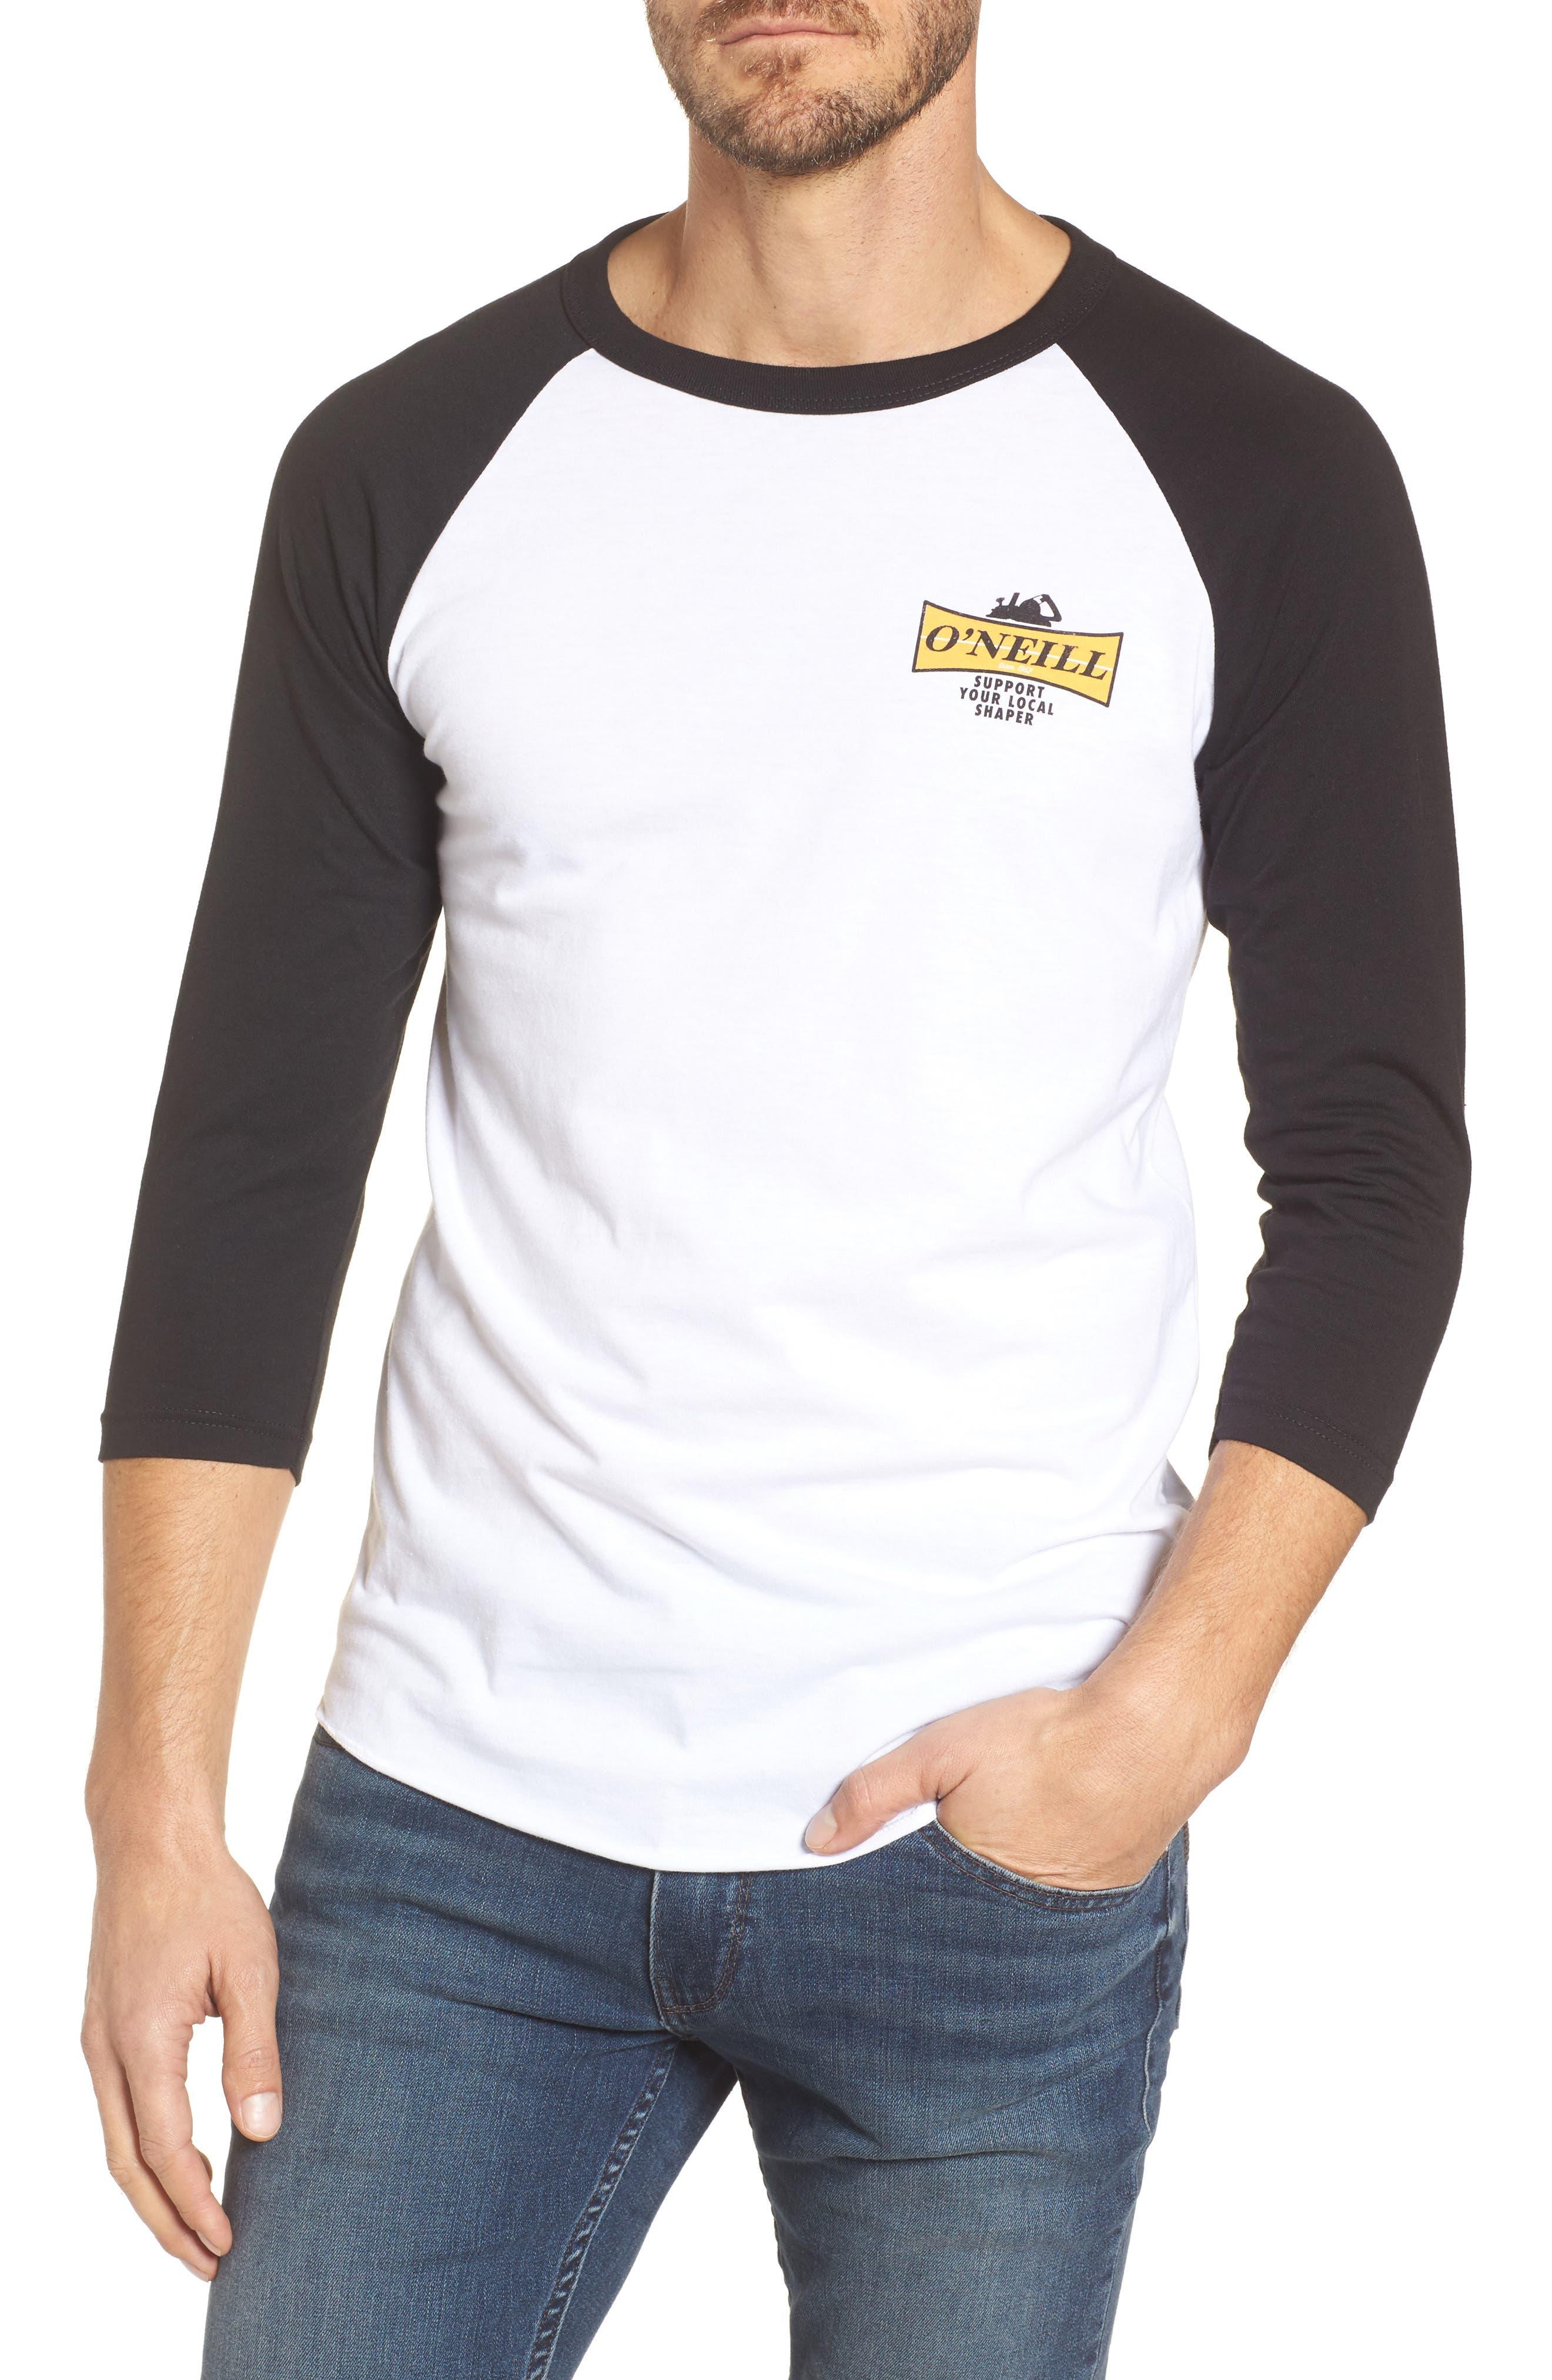 O'Neill Planer Raglan T-Shirt